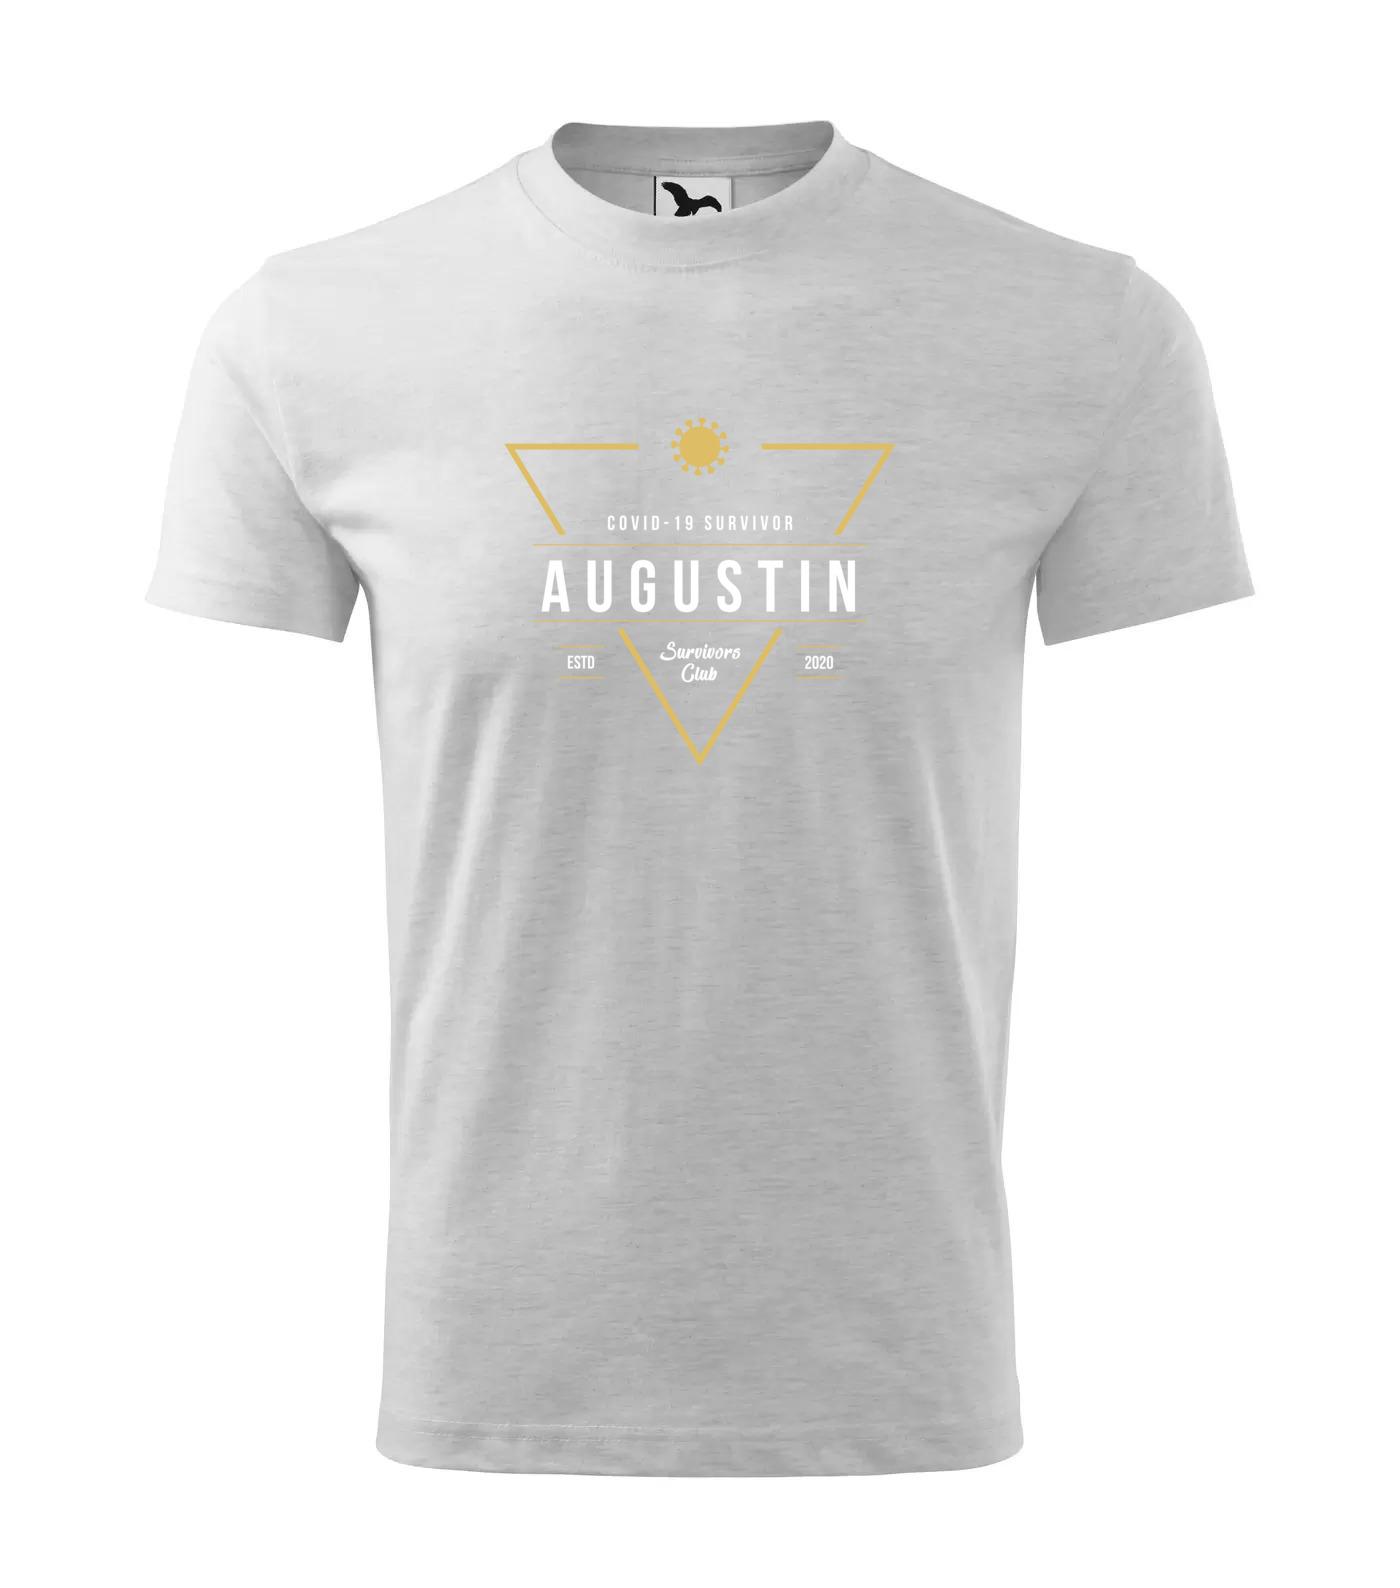 Tričko Survivor Club Augustin